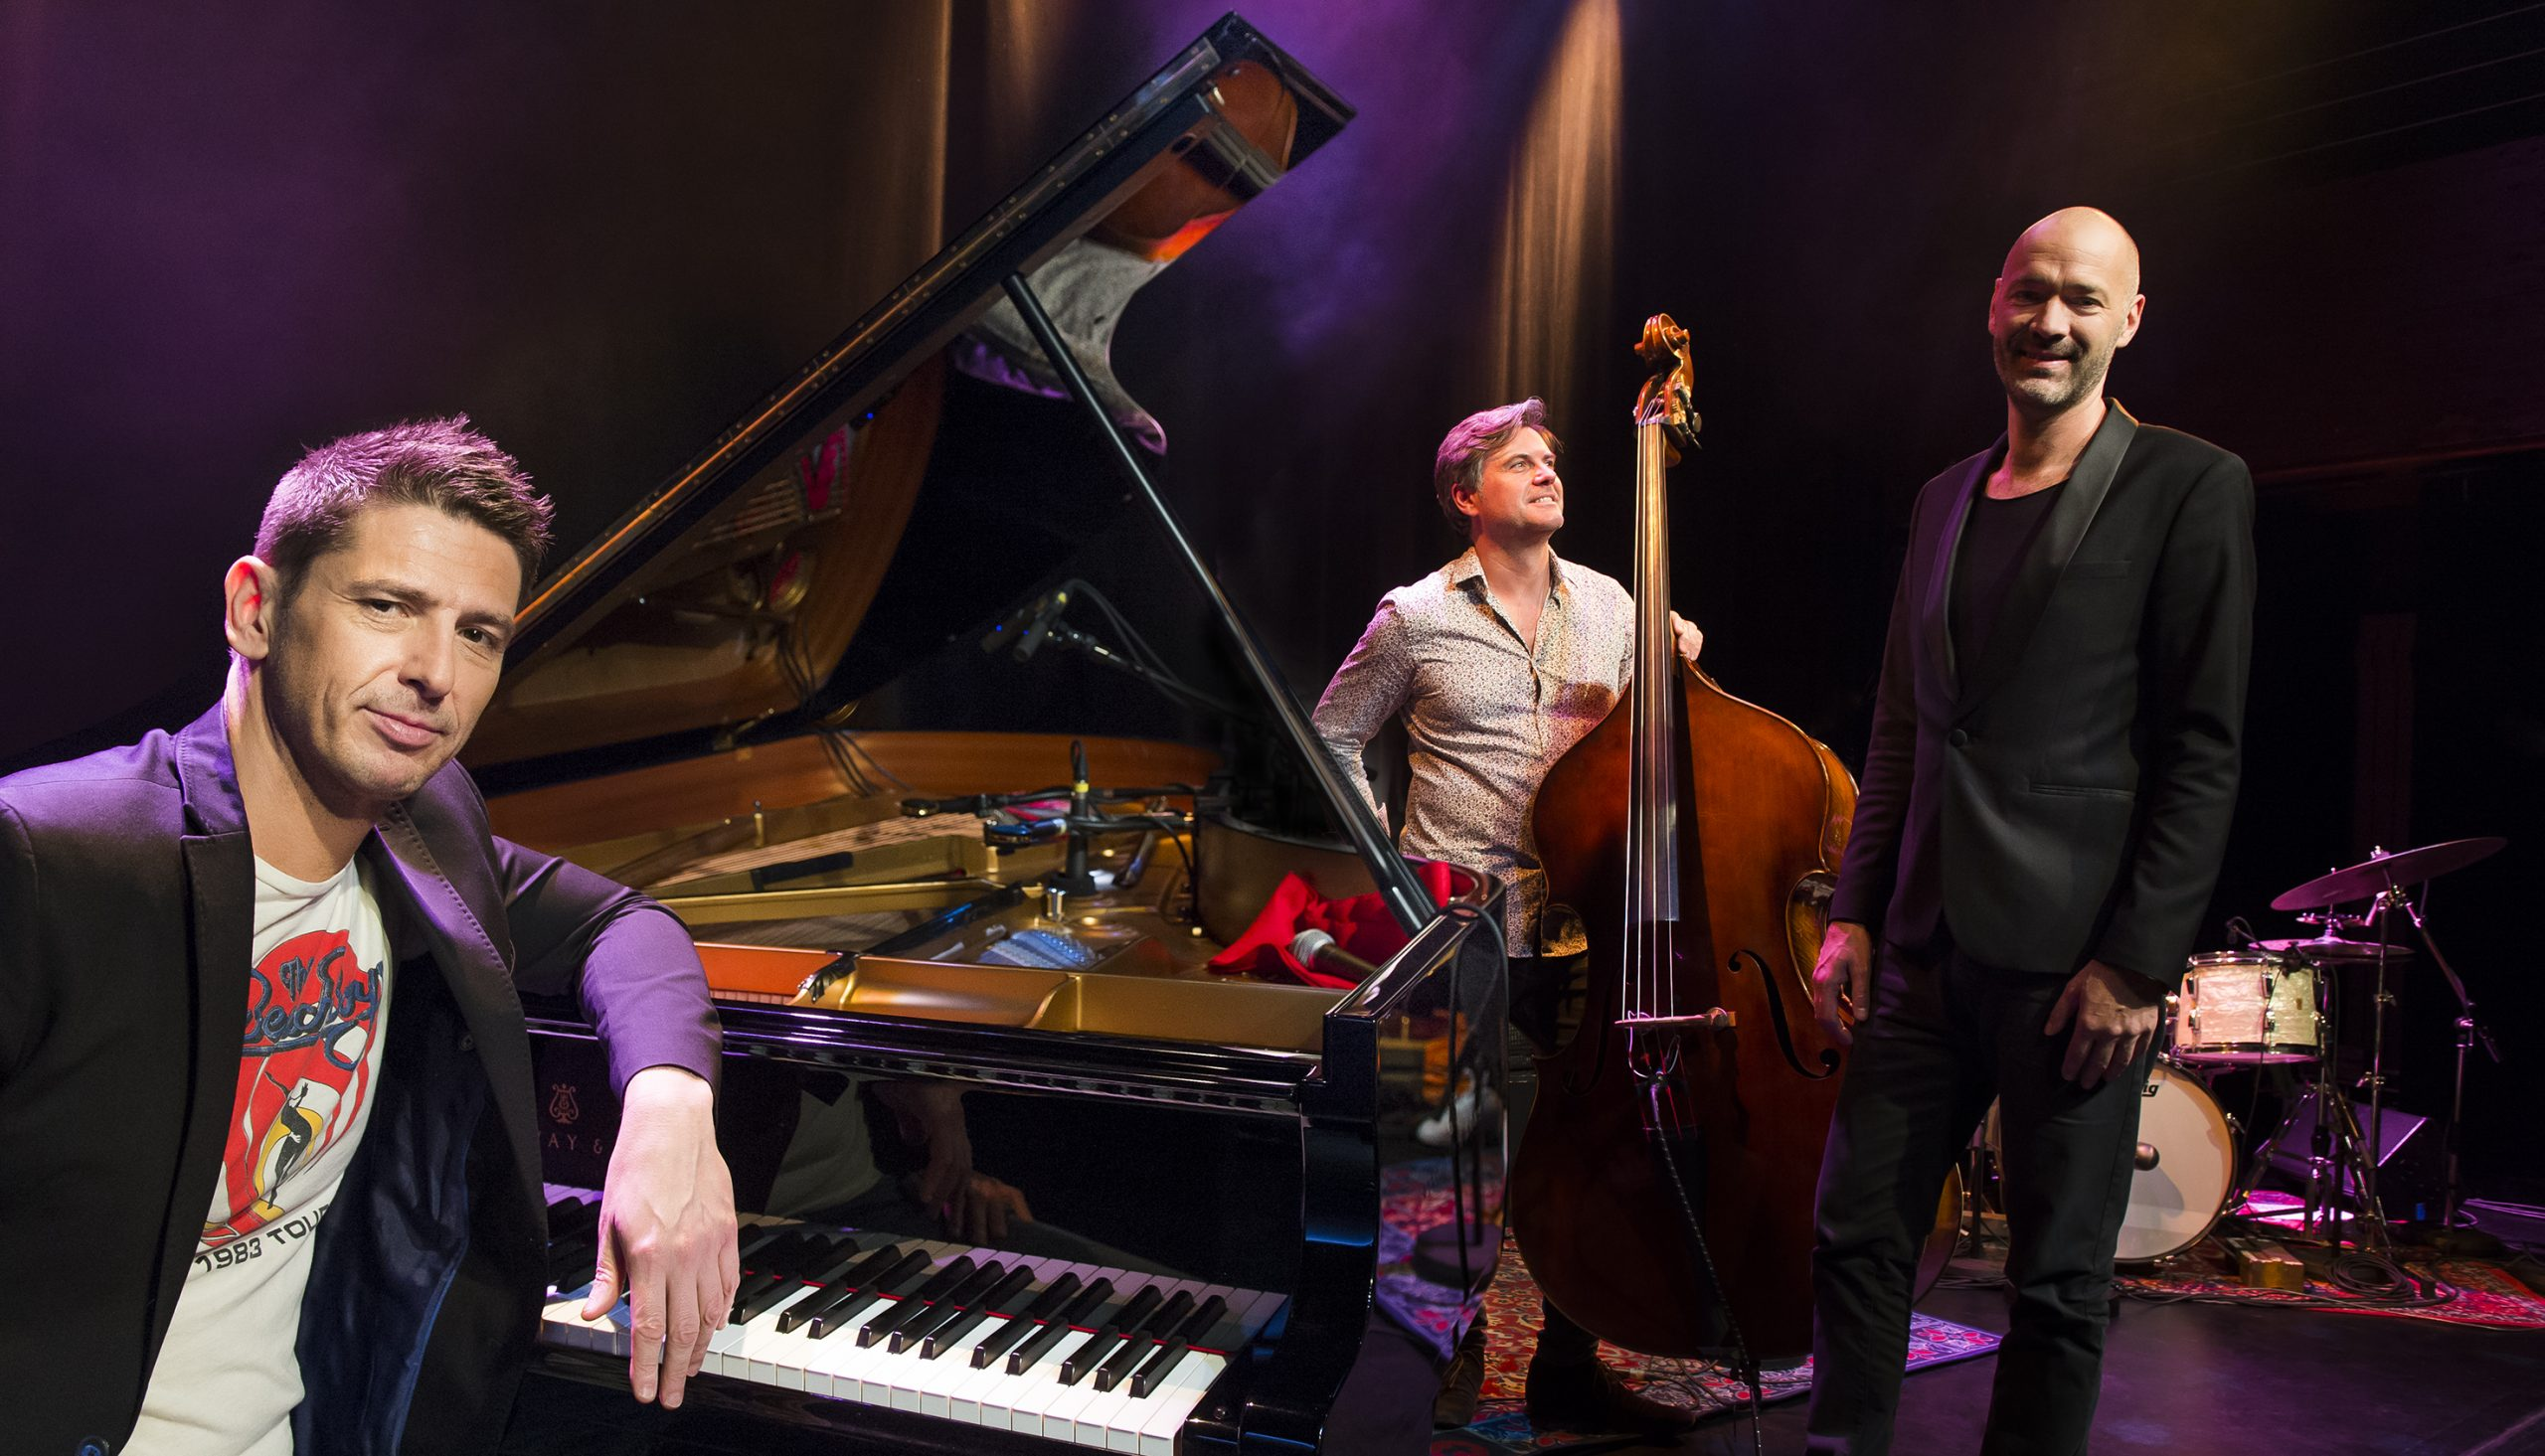 Gainsbourg & Miles - Grégory Ott Trio, Jyzzel & Matskat